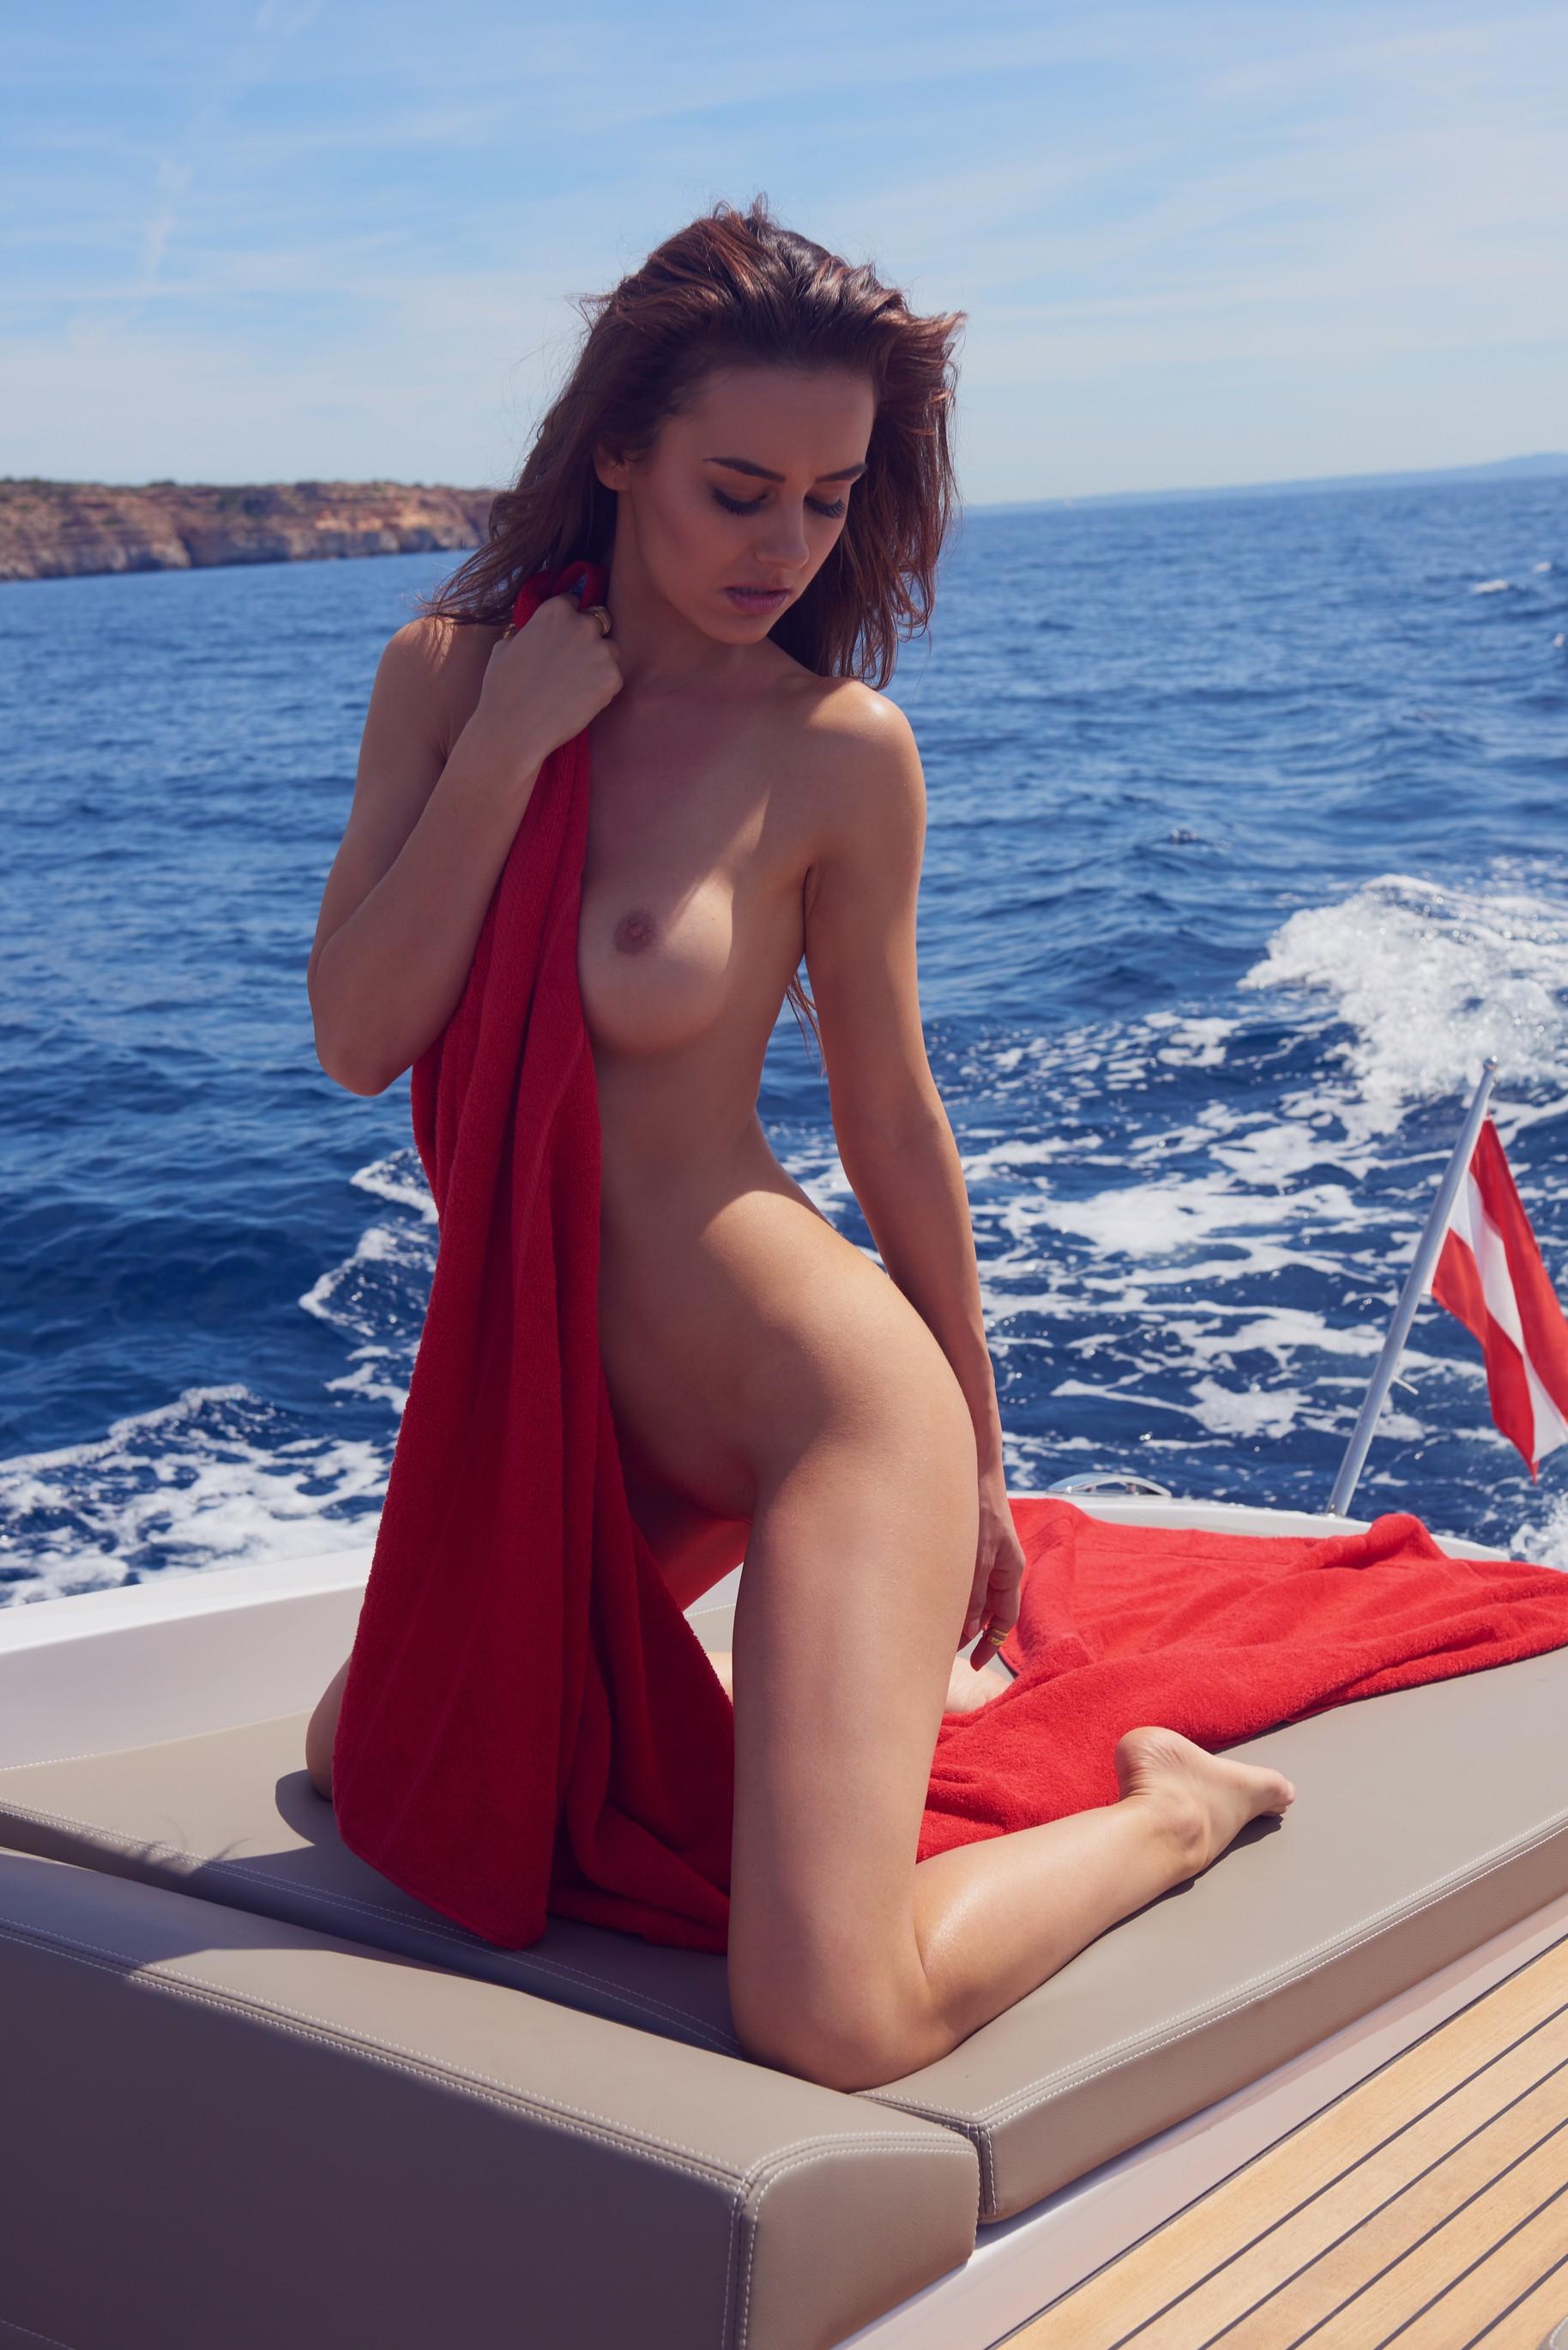 veronika-klimovits-naked-diving-motorboat-seaside-playboy-16